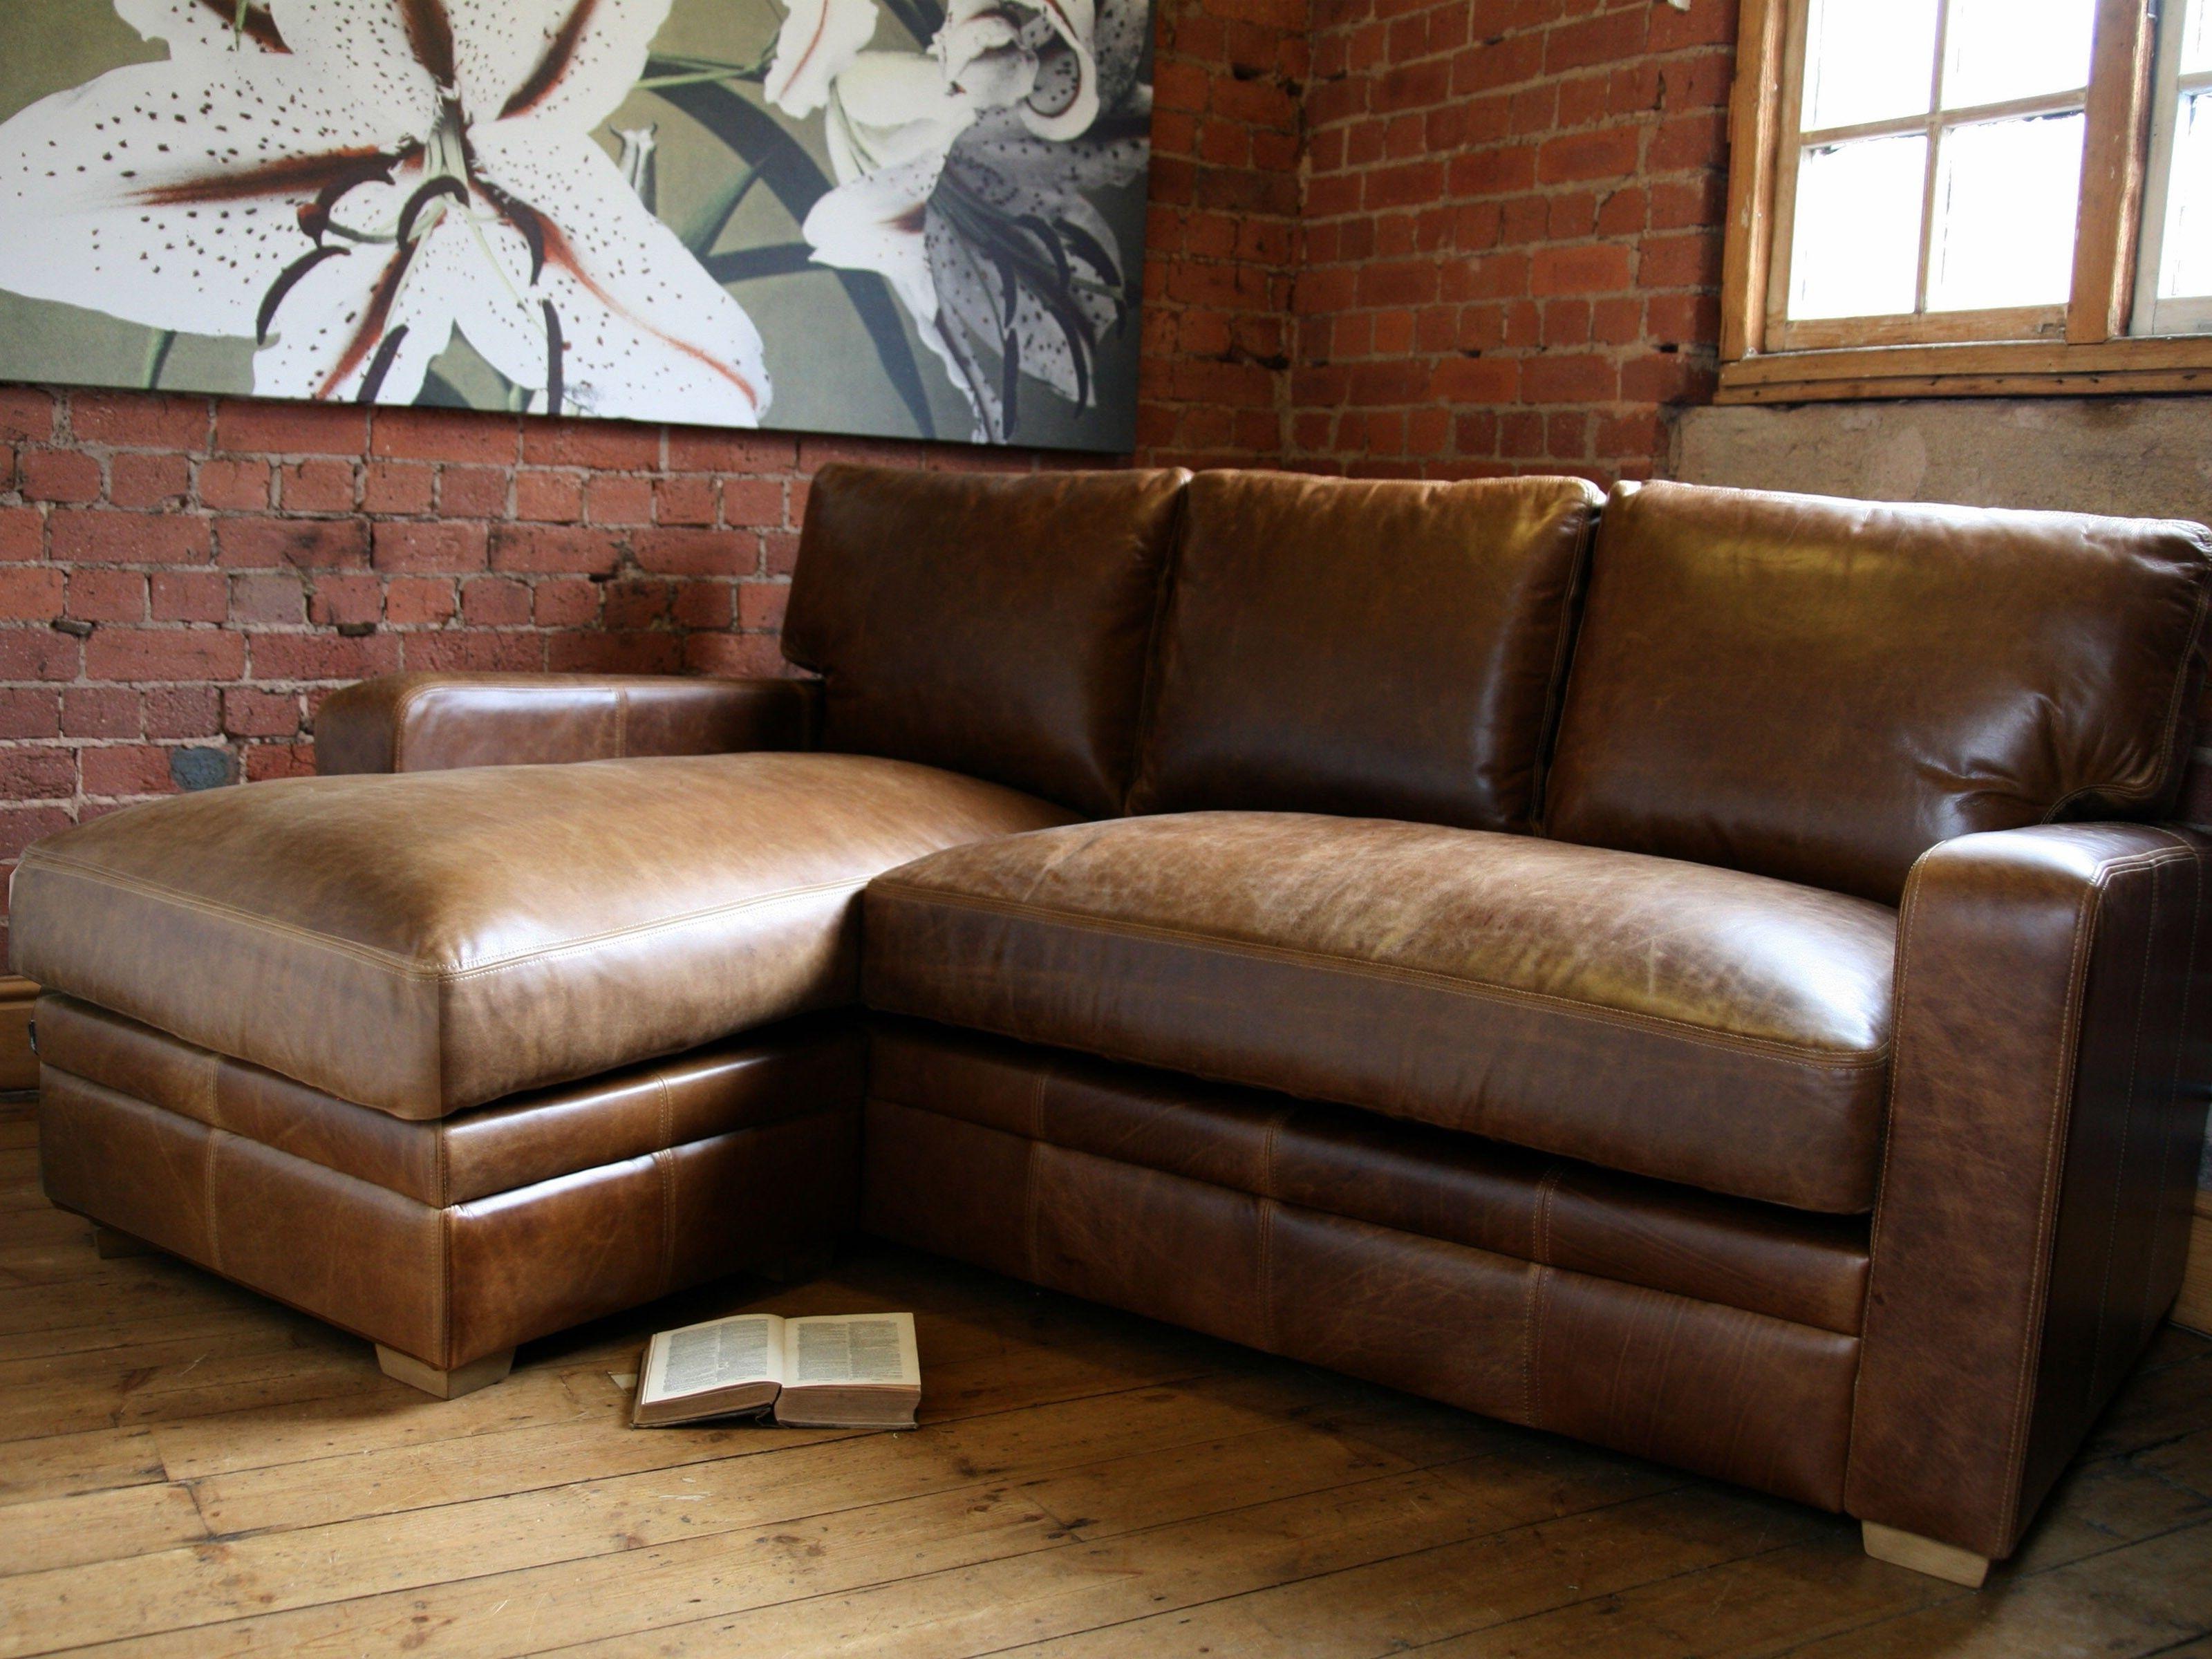 Recent Full Grain Leather Sofas Throughout Full Grain Leather Furniture Stores, Carla Salotti Dima Salotti (View 15 of 15)